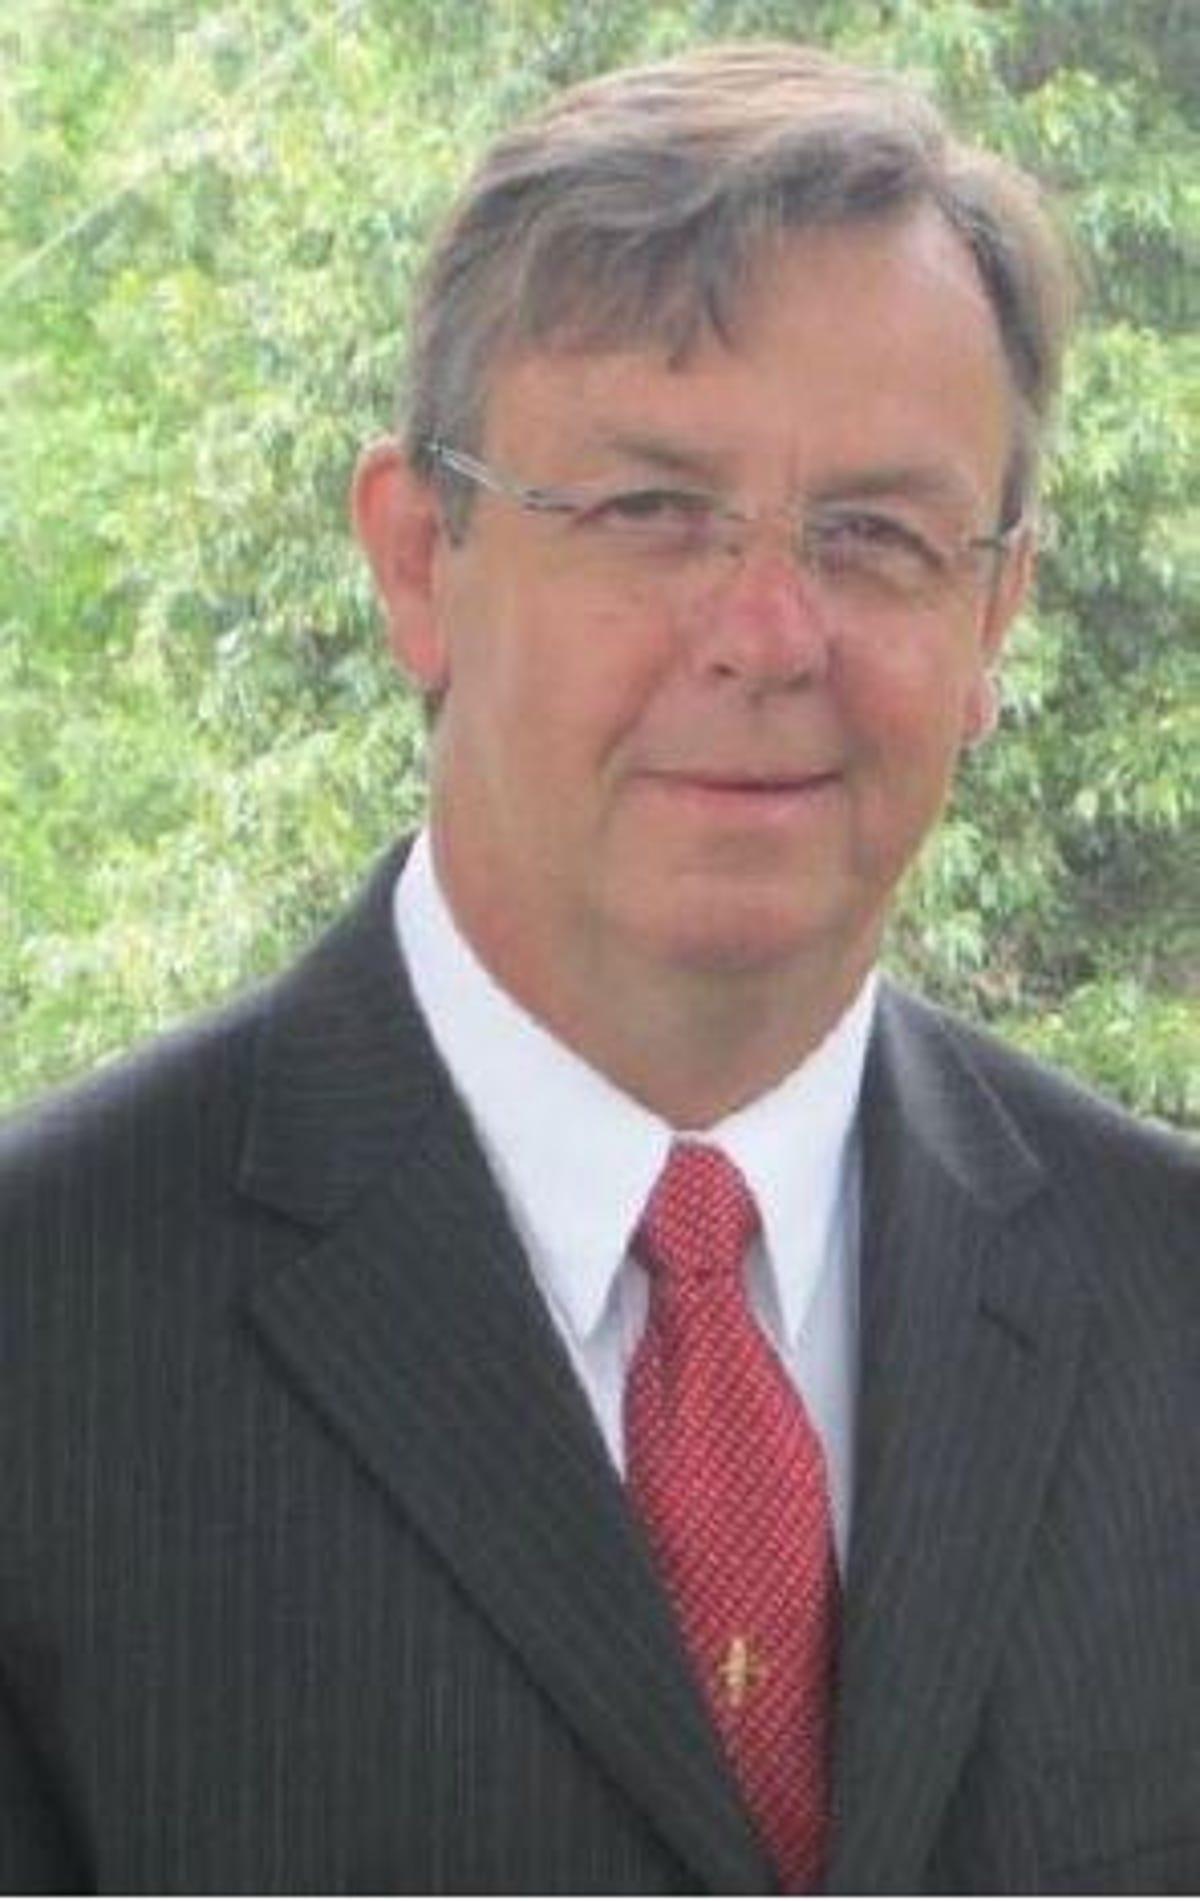 Pershing County deputies search for missing Arkansas man